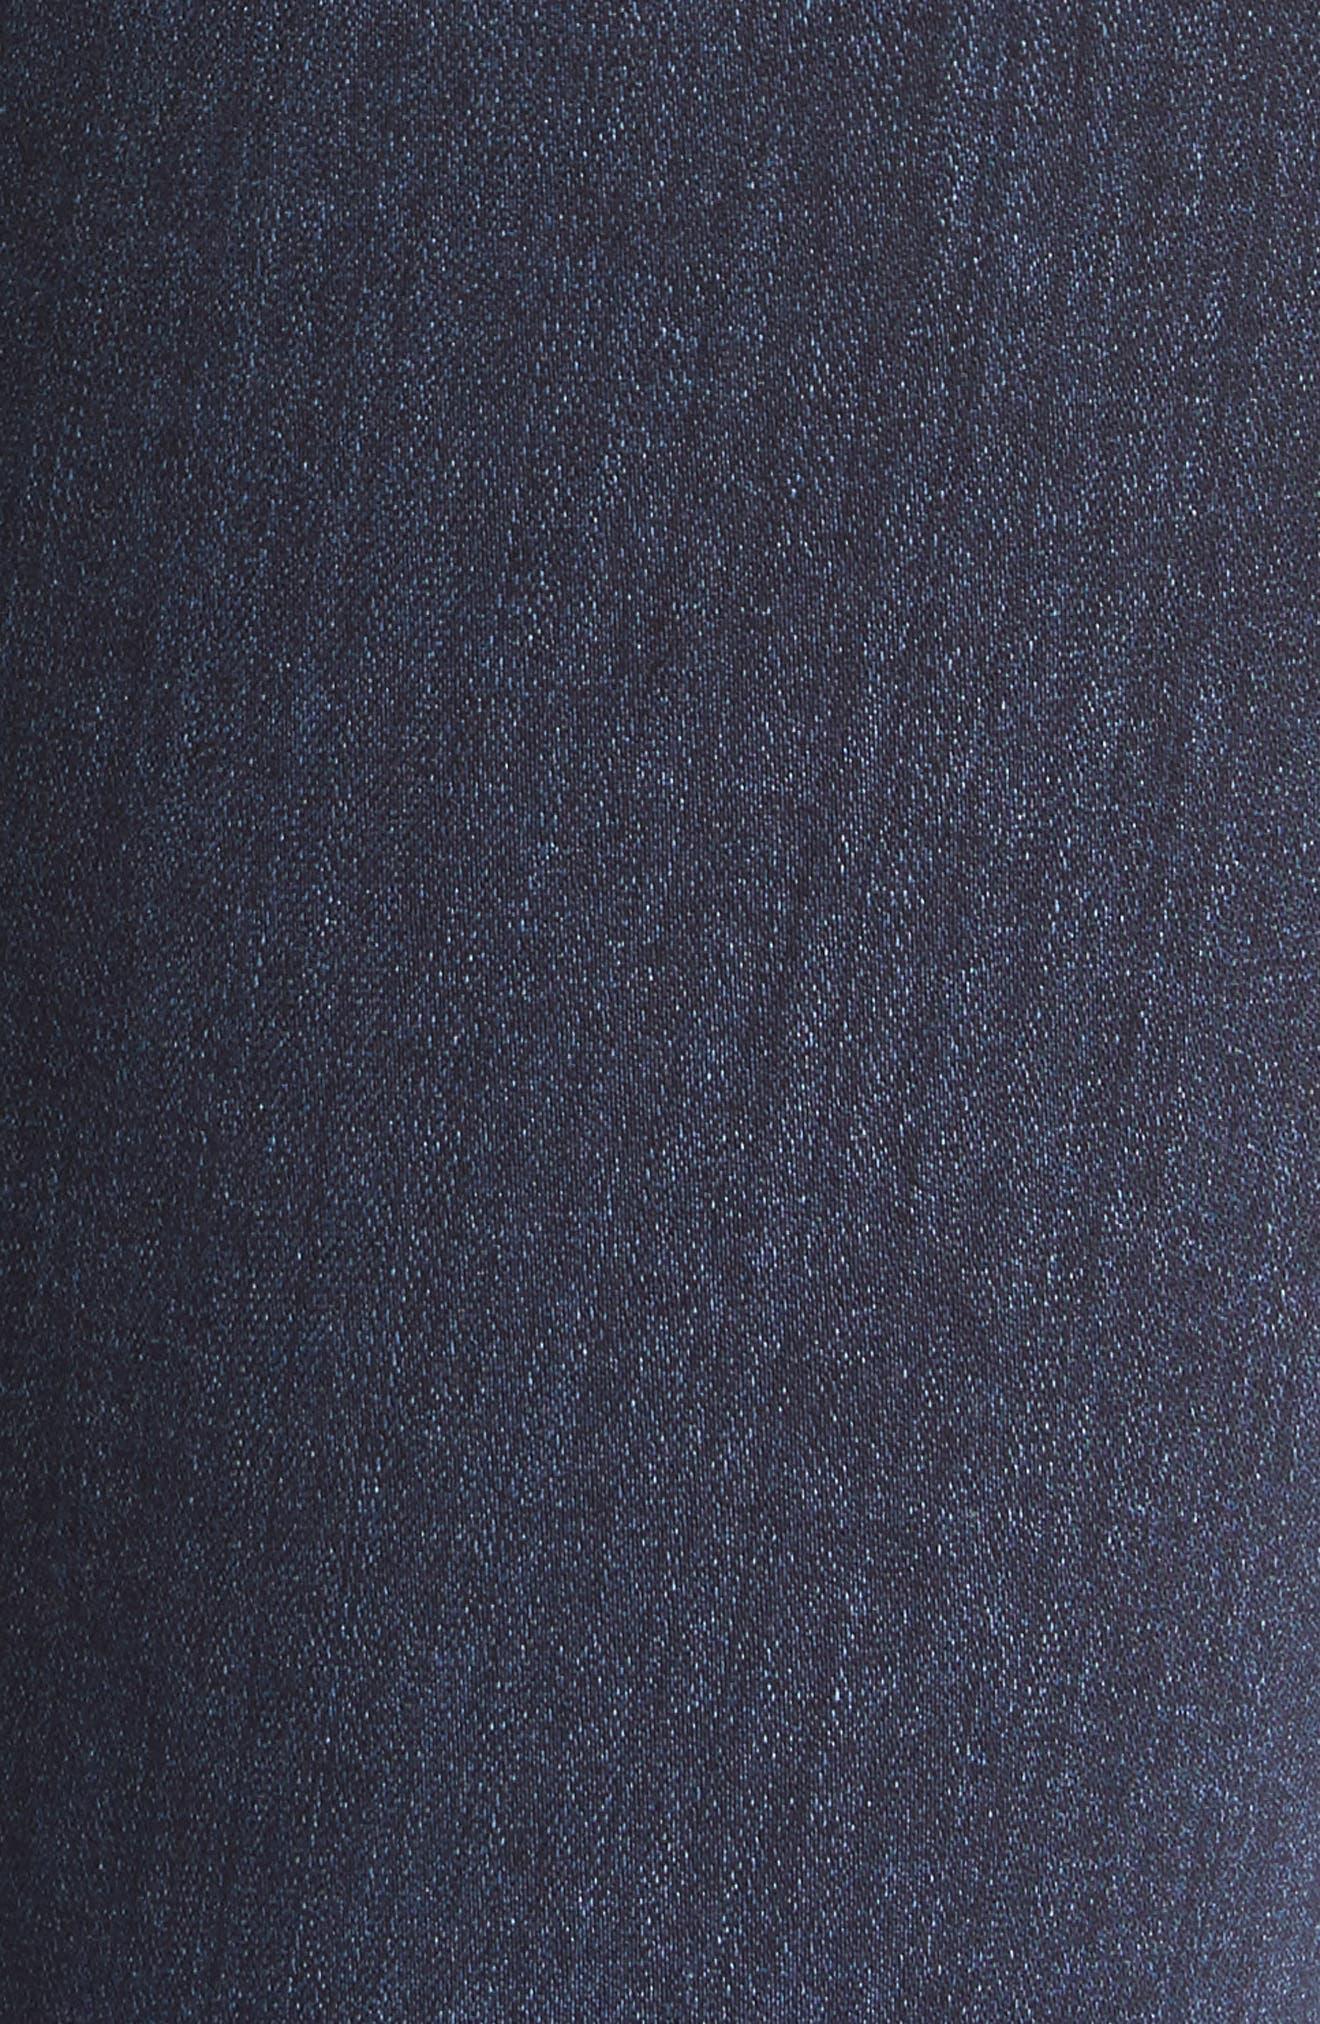 Transcend - Hoxton High Waist Ankle Skinny Jeans,                             Alternate thumbnail 6, color,                             400